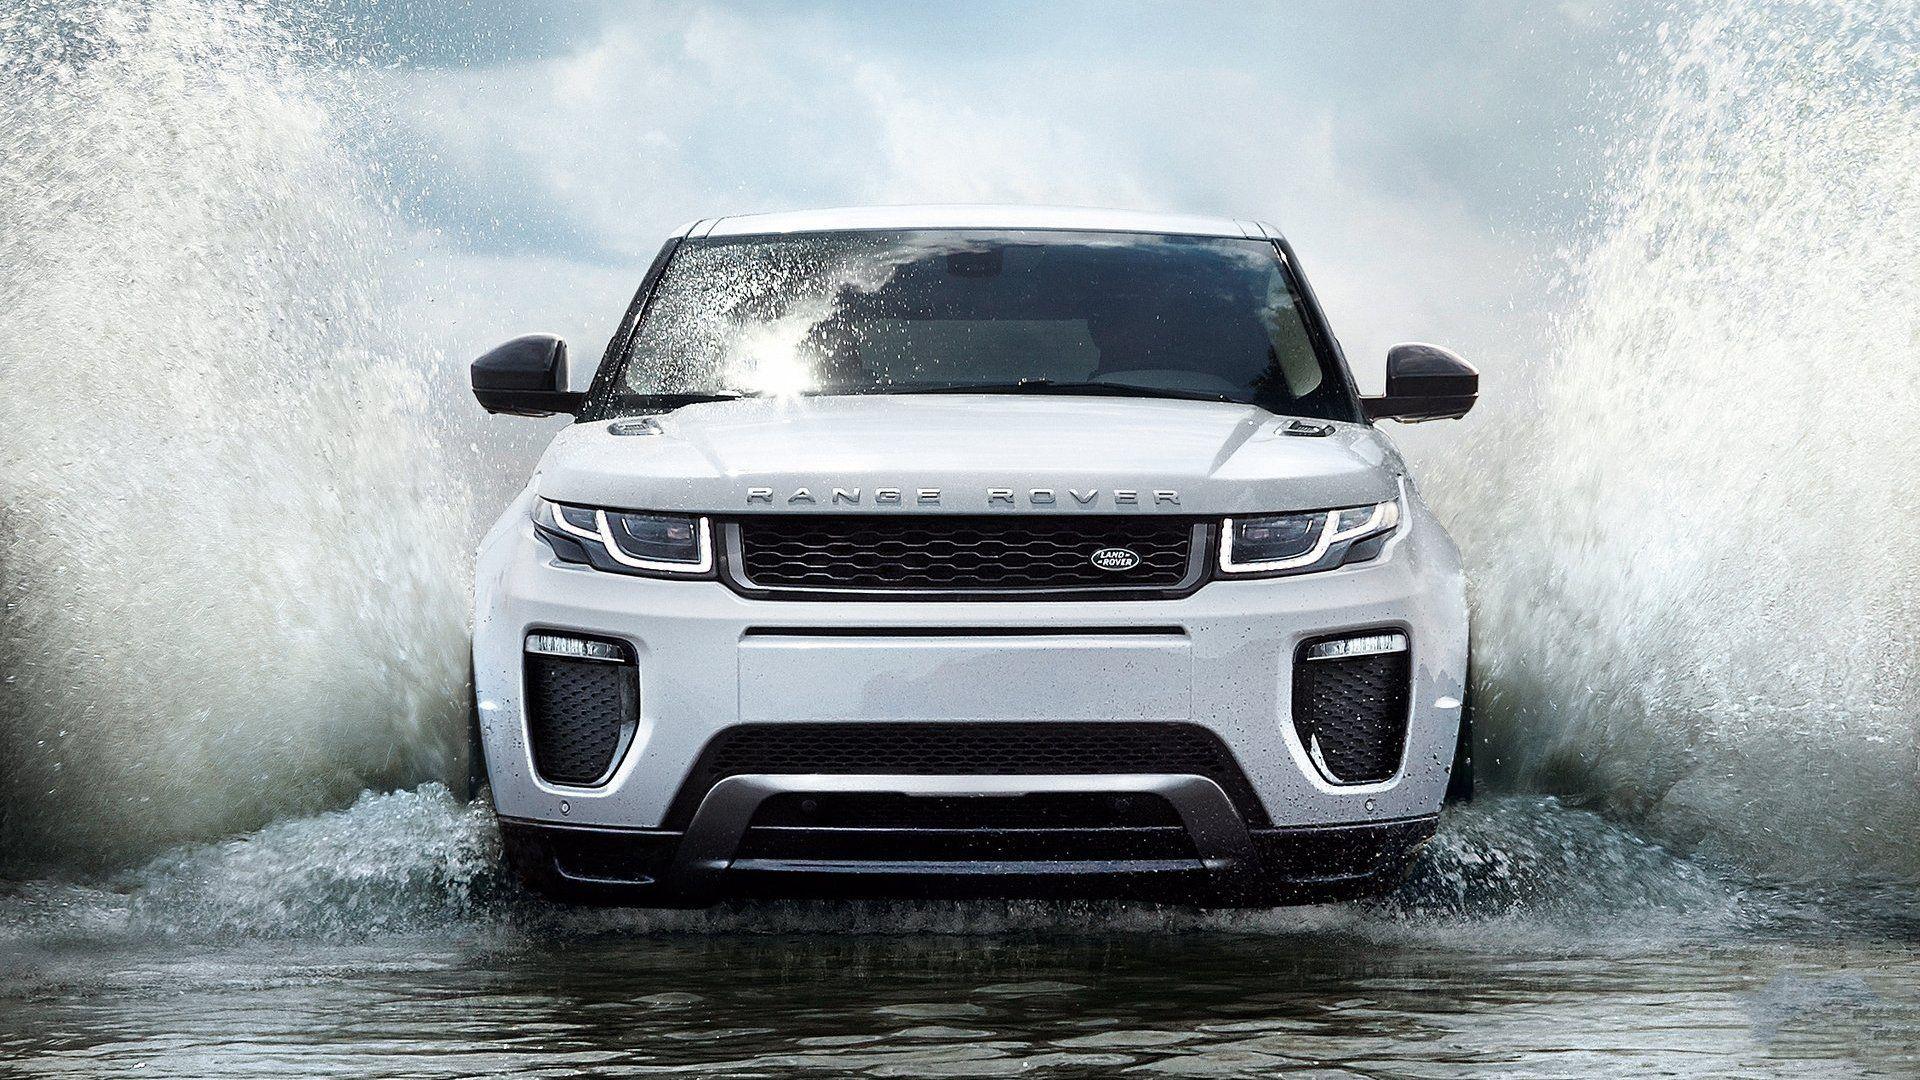 Jlr Launches Range Rover Evoque Petrol In India At Inr 53 2 Lakh Range Rover Evoque Review Range Rover Evoque Range Rover Evoque 2016